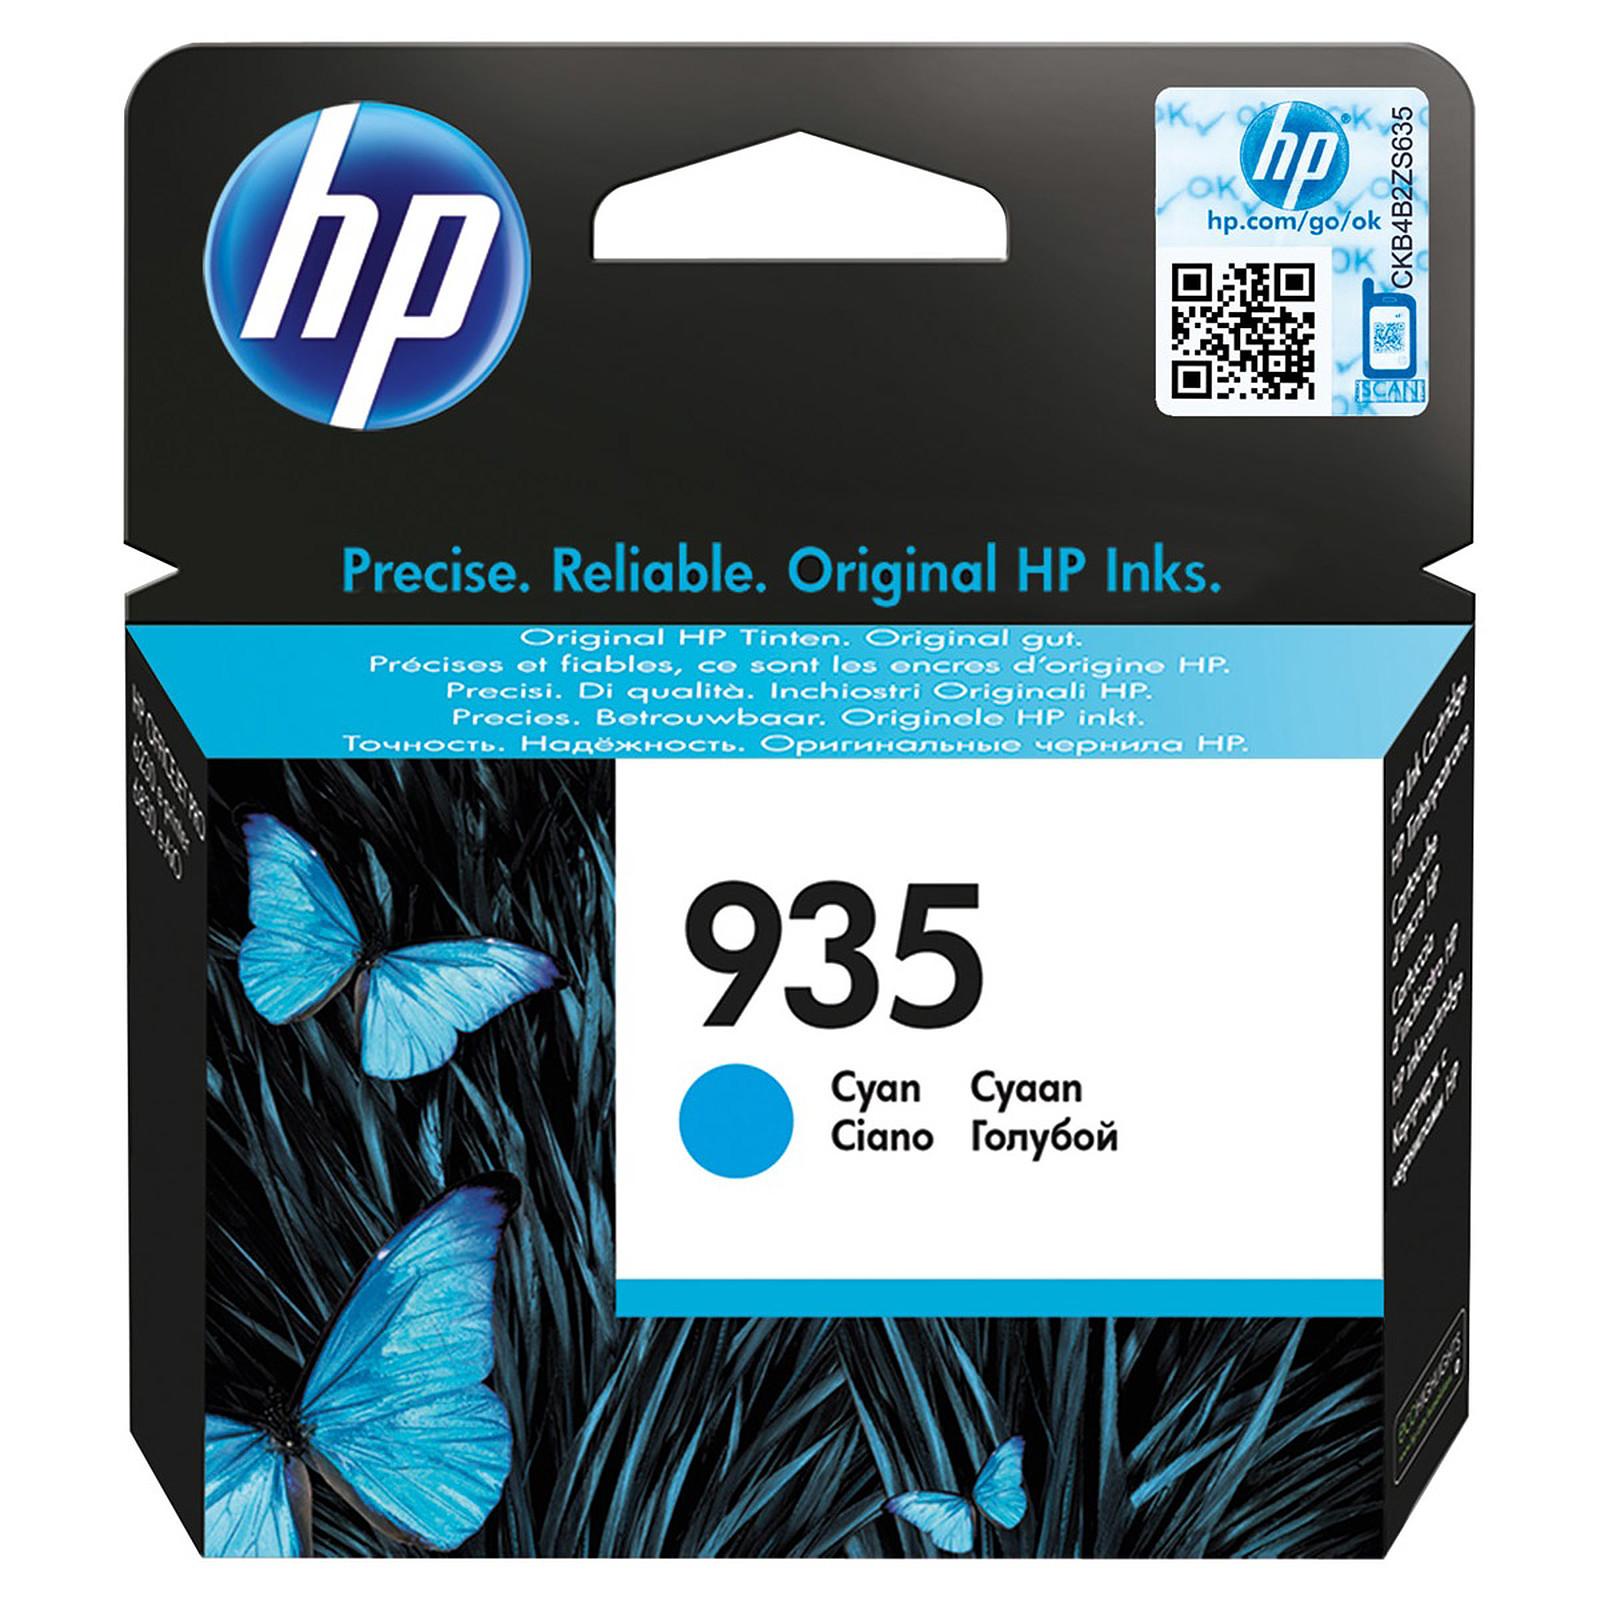 HP 935 Cyan (C2P20AE)